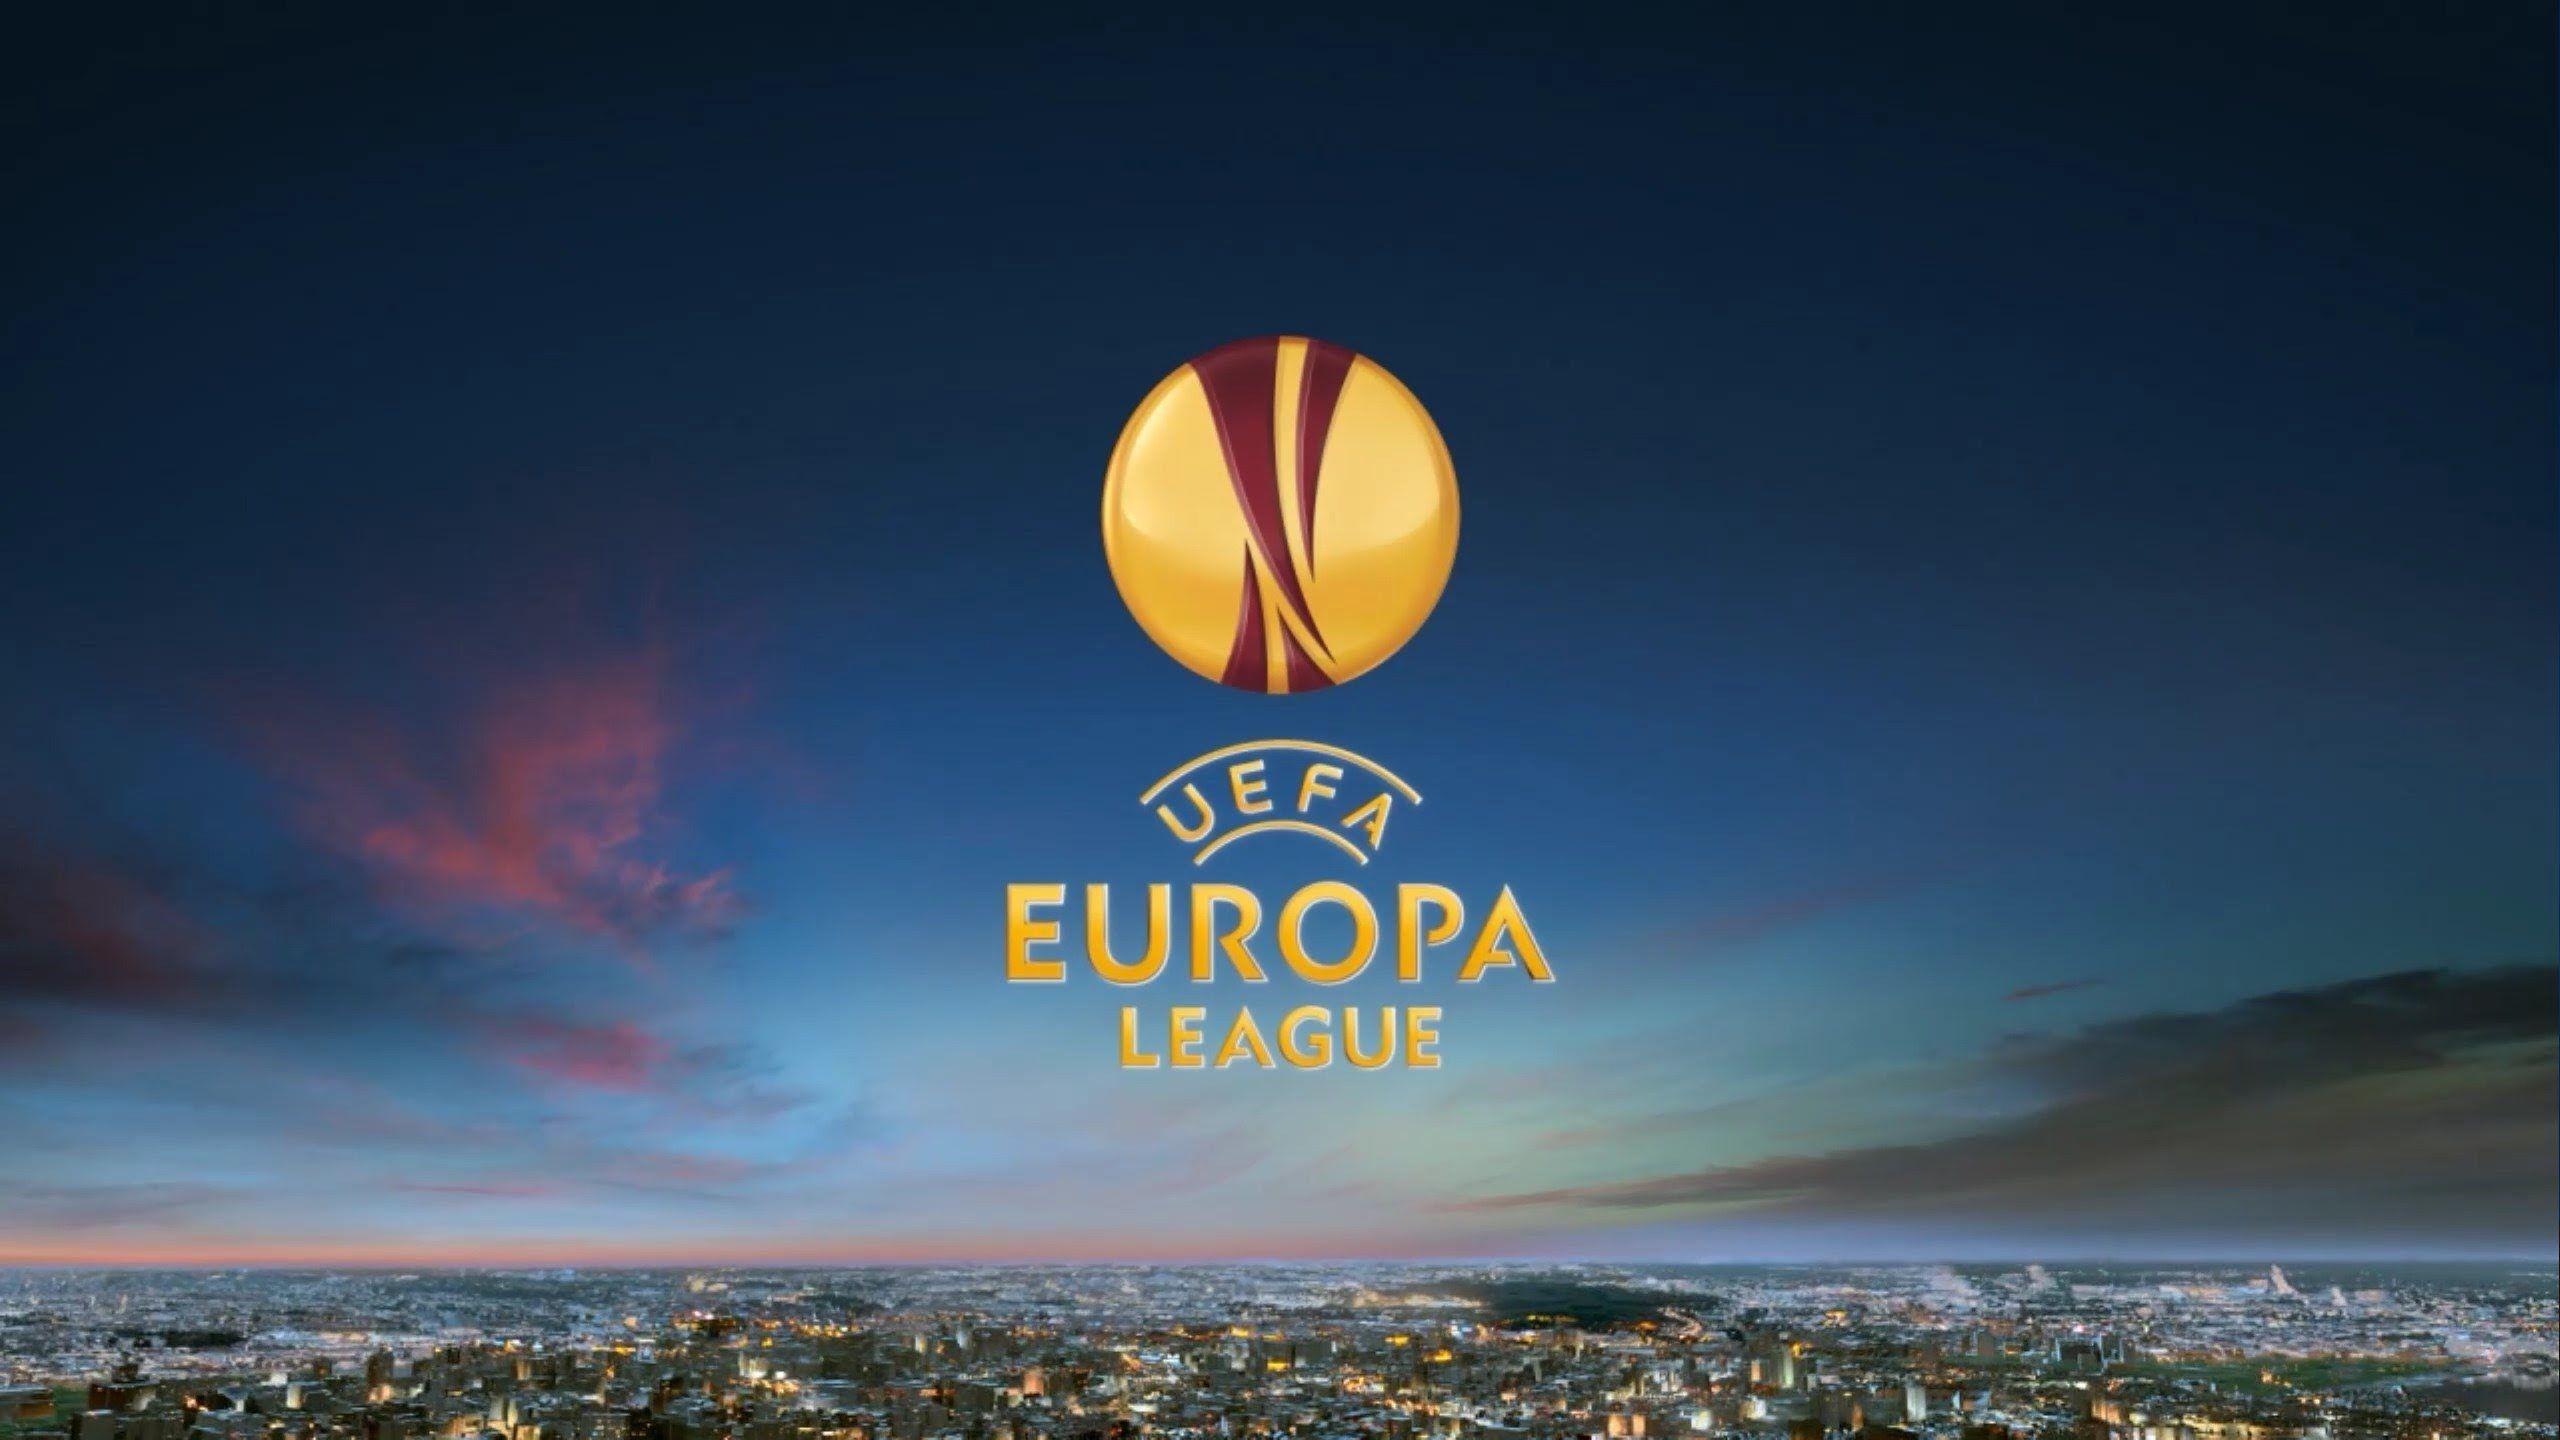 Uefa Europa League Final Sevilla Wins Title 3 1 Over Liverpool Europa League League Match Of The Day